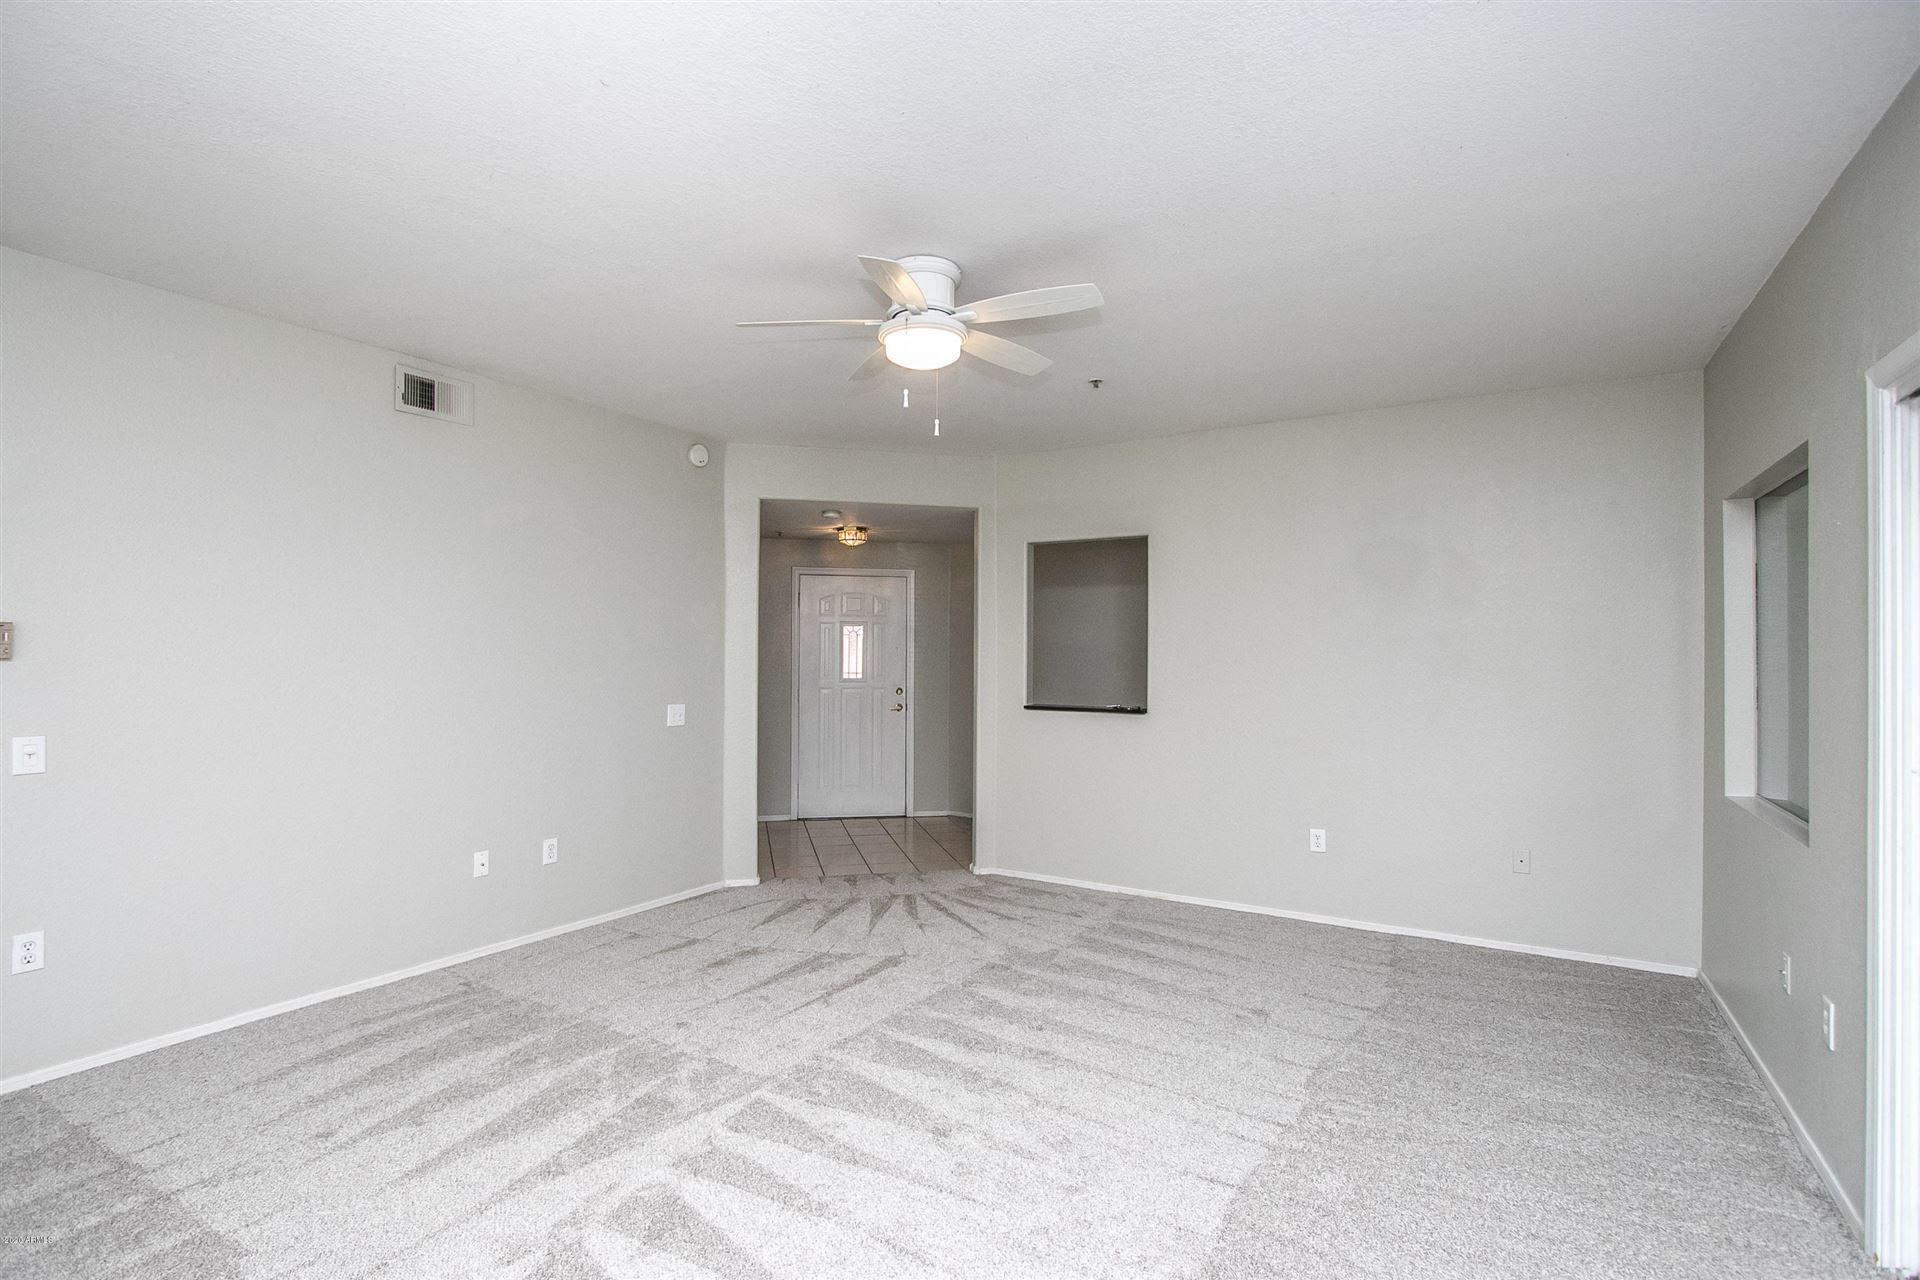 Photo of 9455 E RAINTREE Drive #1049, Scottsdale, AZ 85260 (MLS # 6200883)